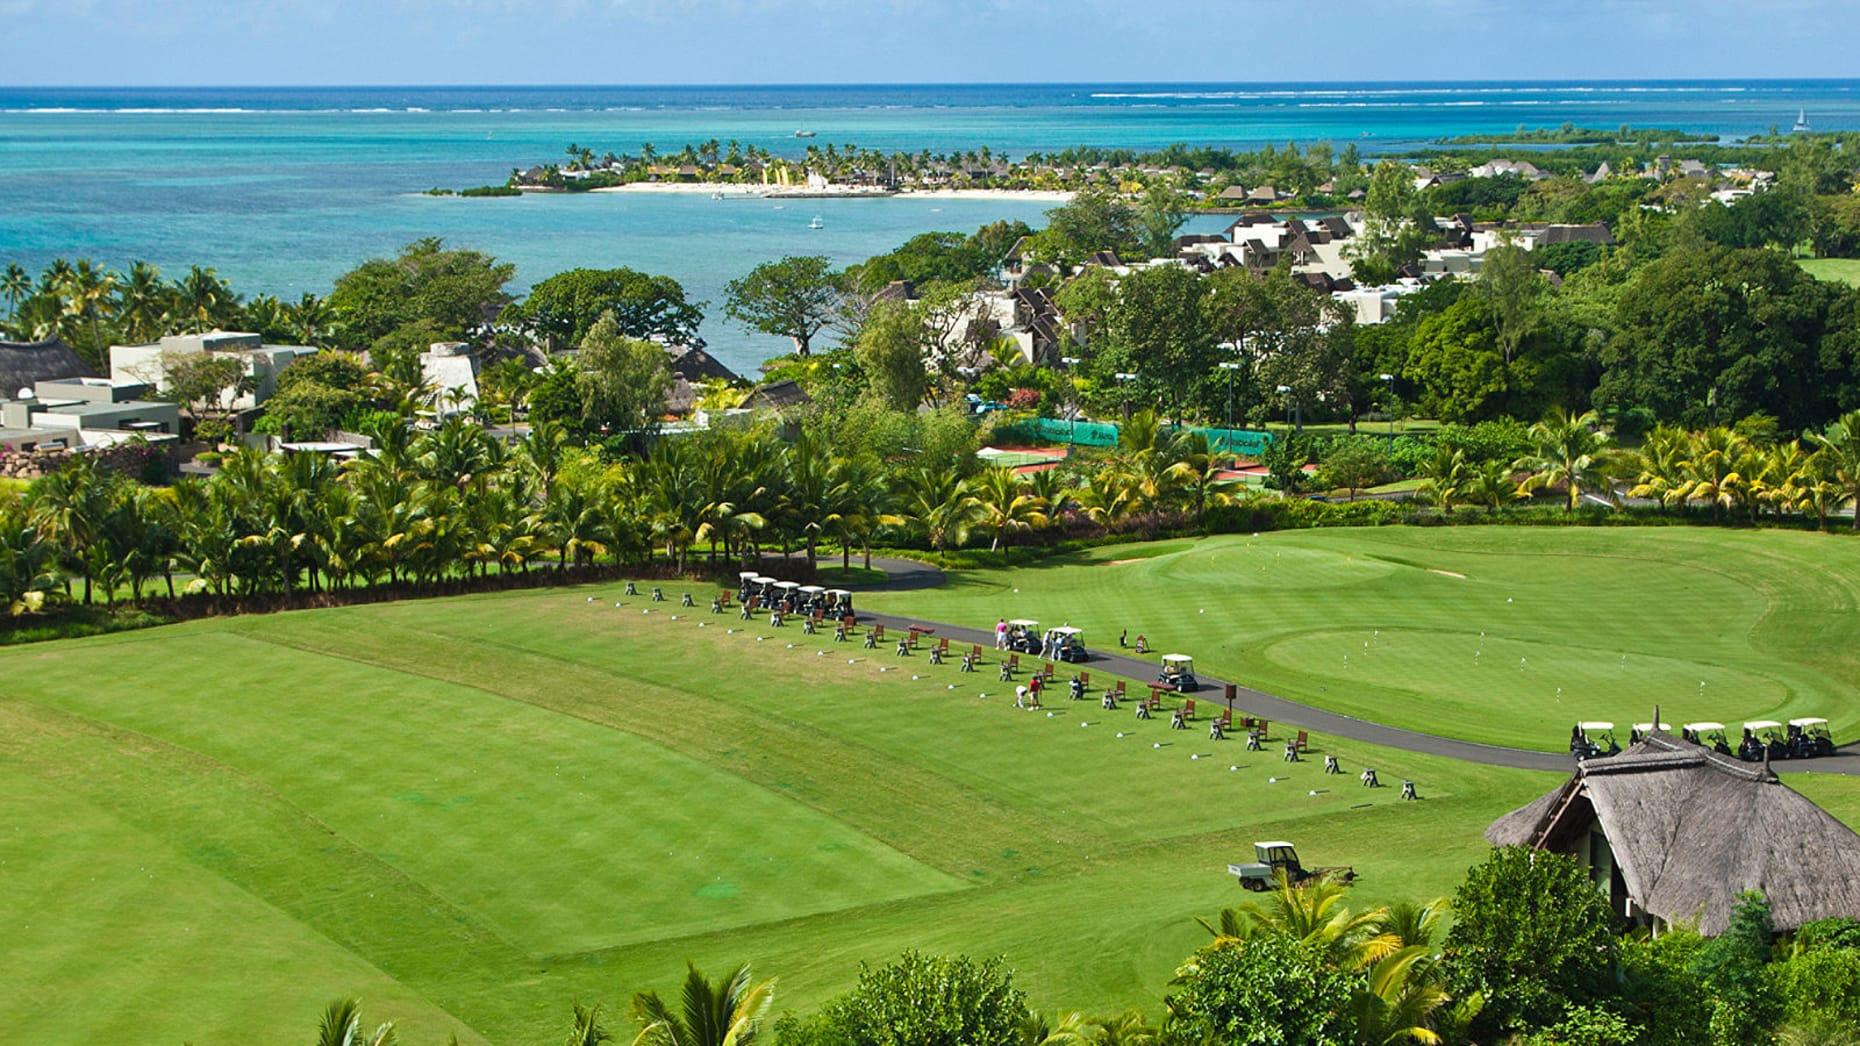 Golf and Spa Resort of the Week: Four Seasons Resort Mauritius at Anahita